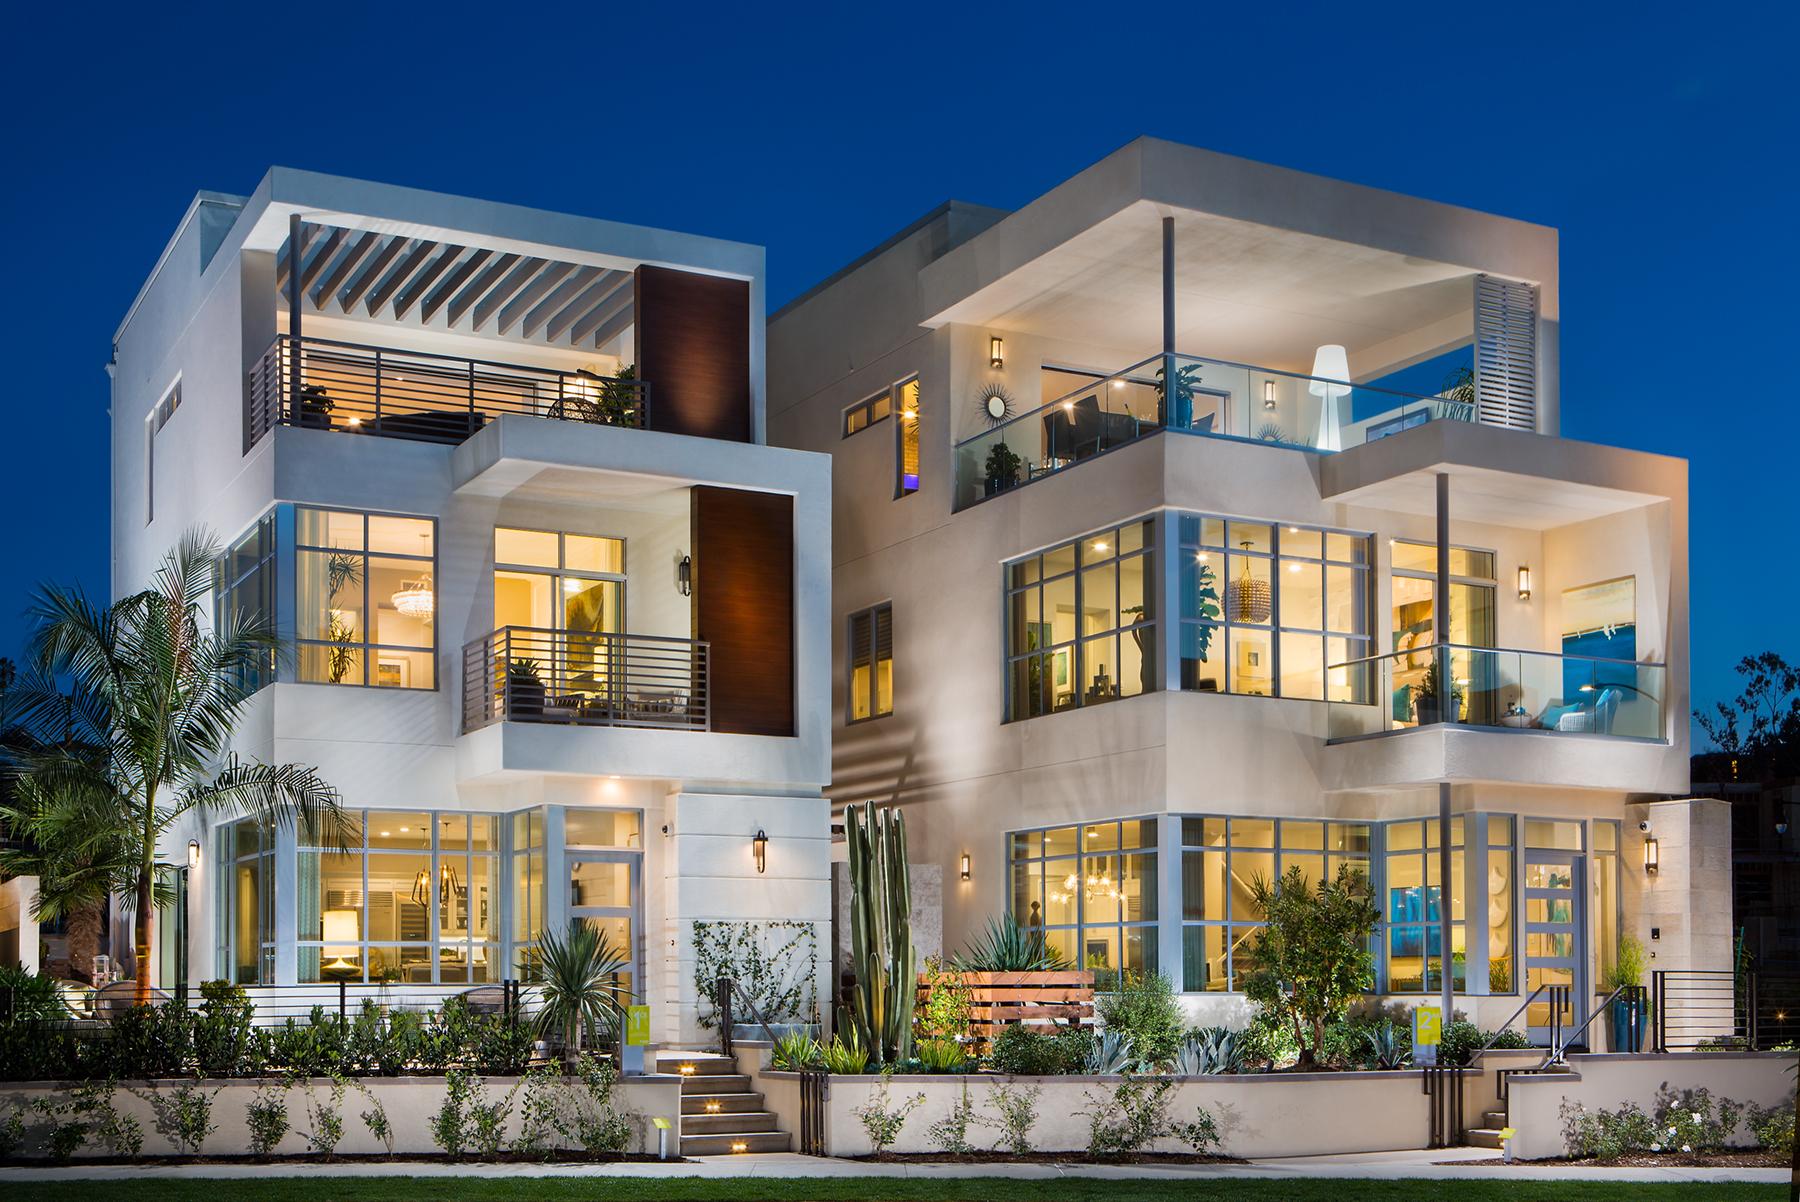 Everly & Marlowe Designer-Furnished Residences | Playa Vista